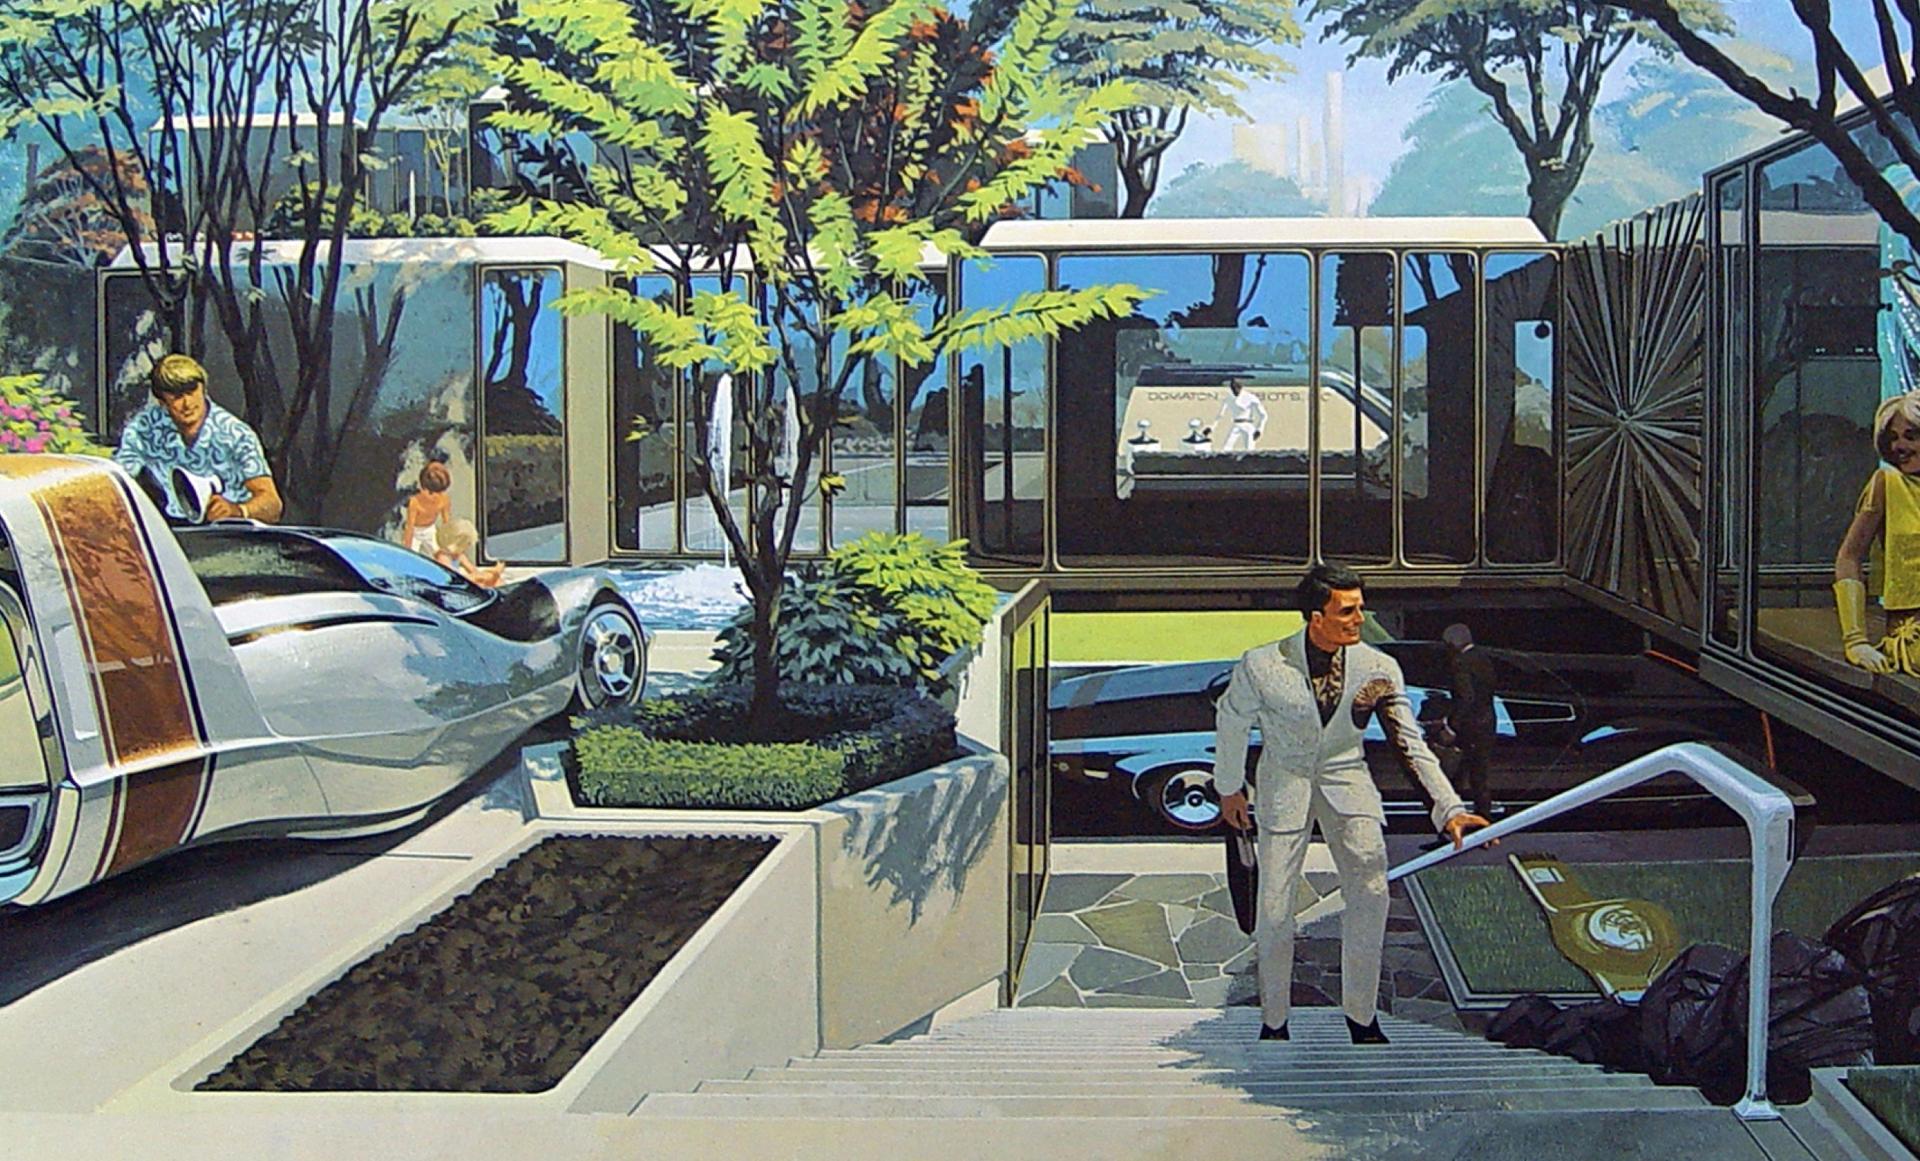 Кино, автопилот и батарейки: какими будут автомобили через 10-20 лет?. Фото 20